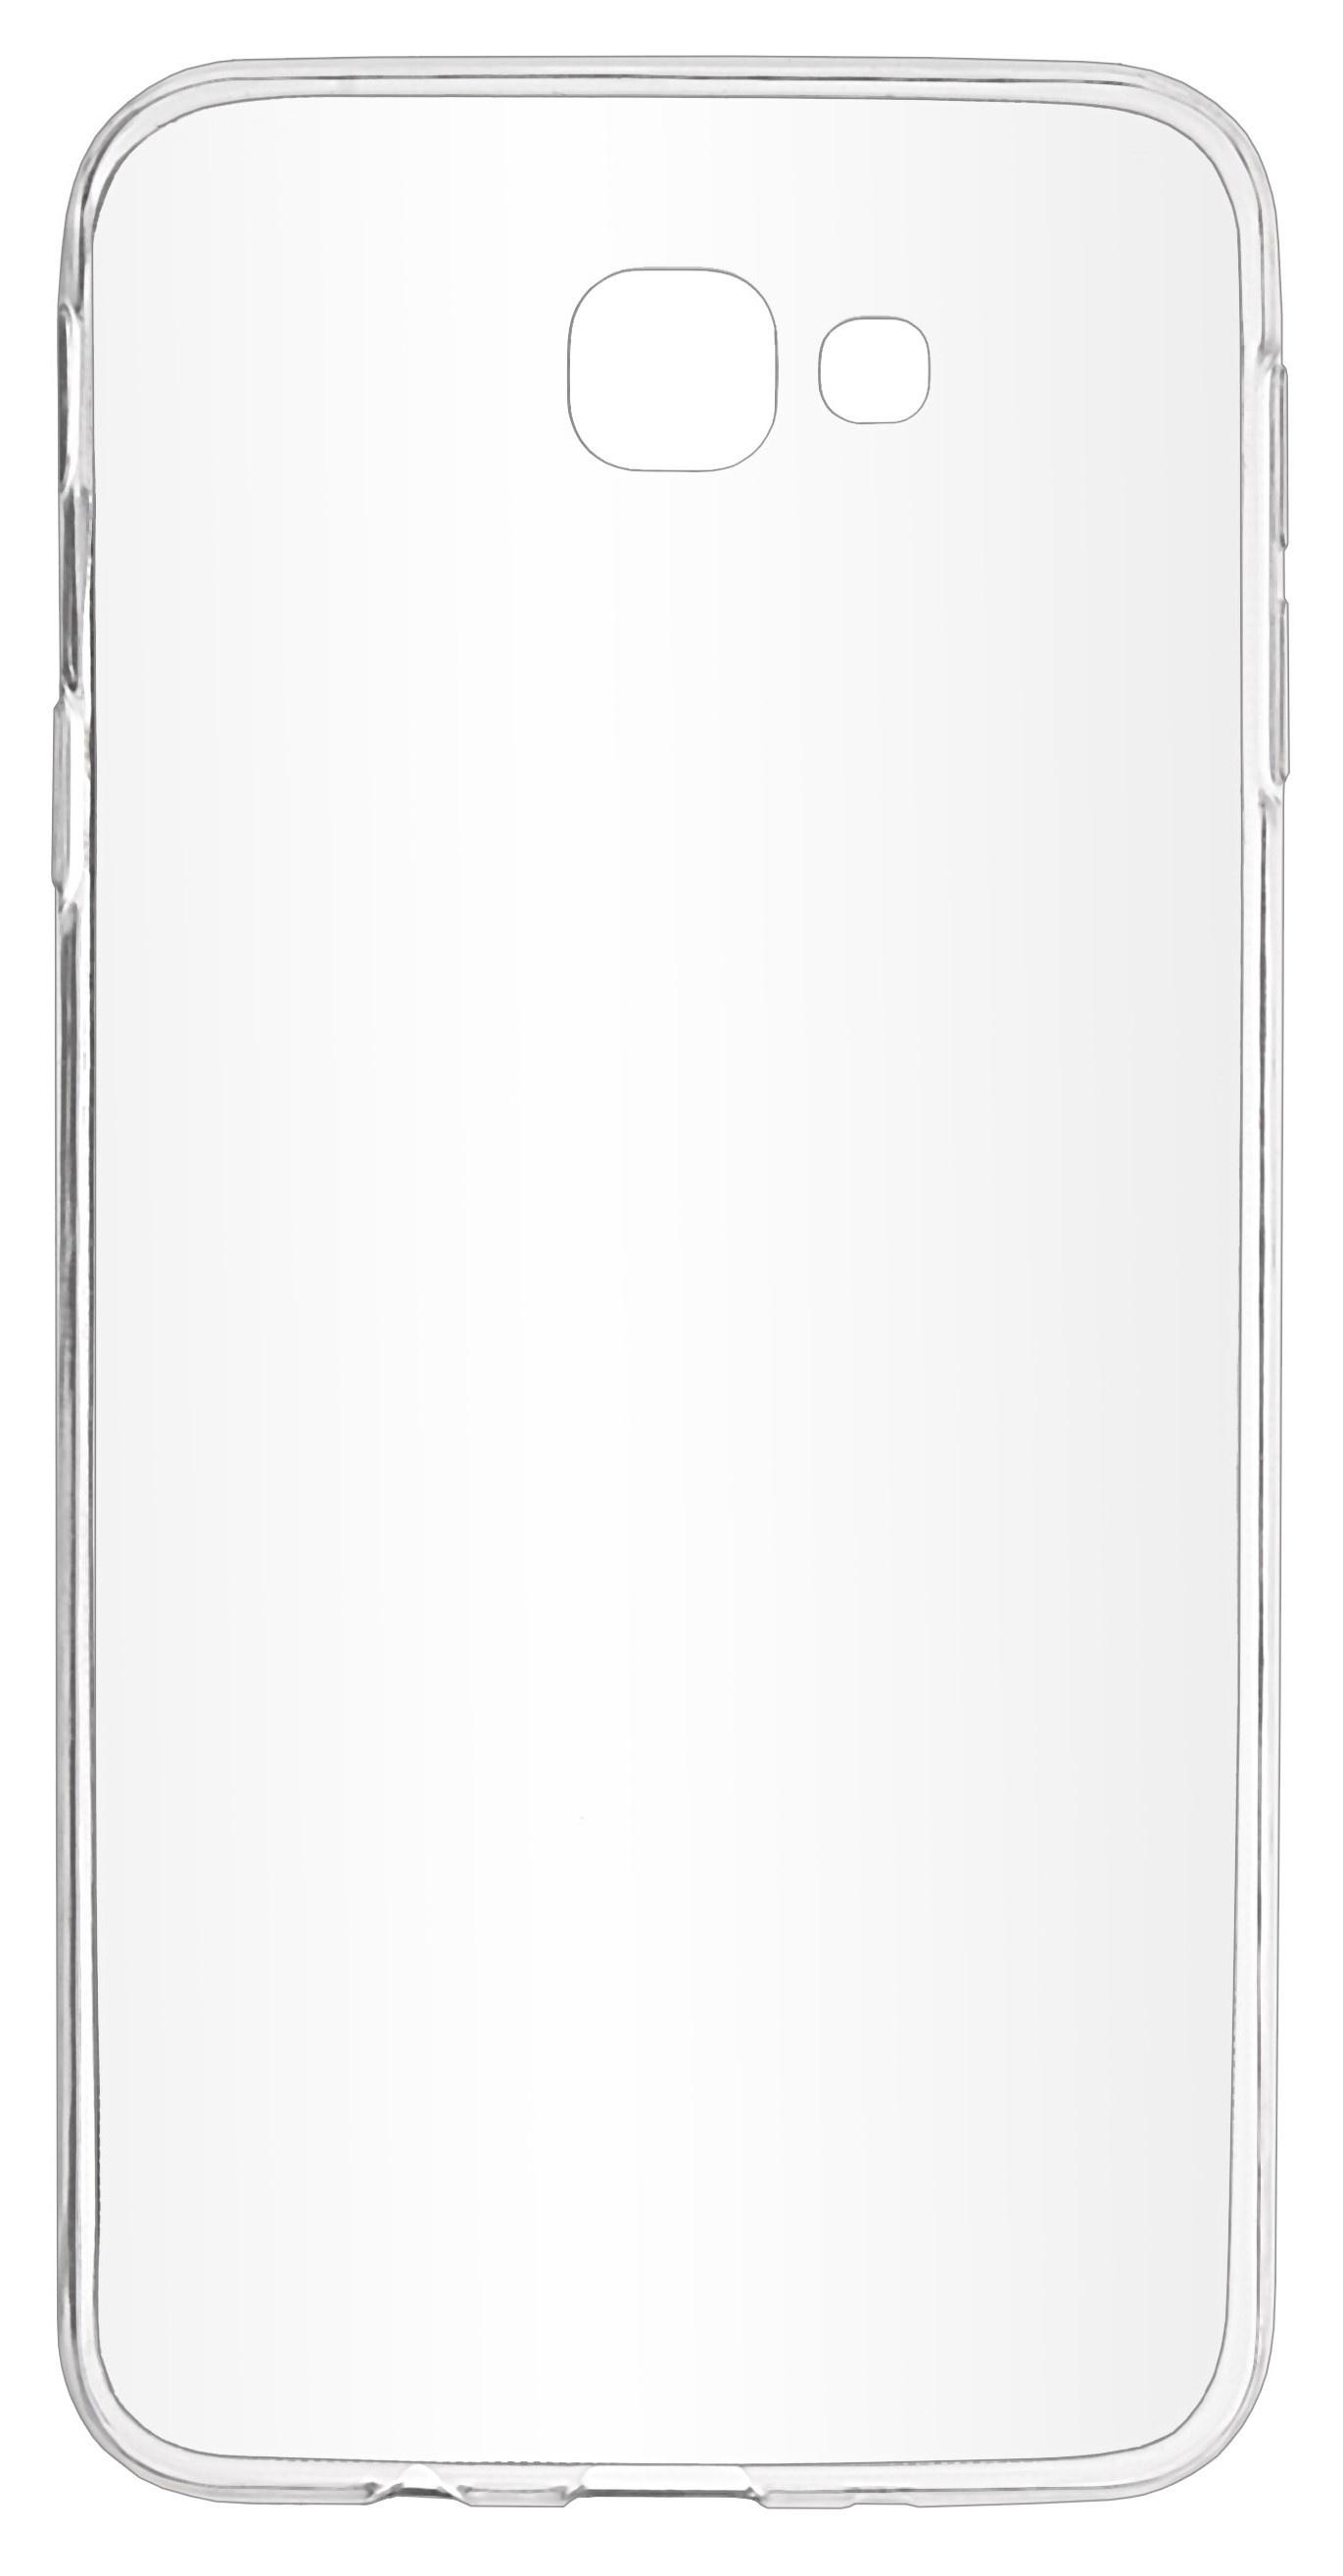 Чехол для сотового телефона skinBOX Slim Silicone, 4630042529250, прозрачный цена и фото